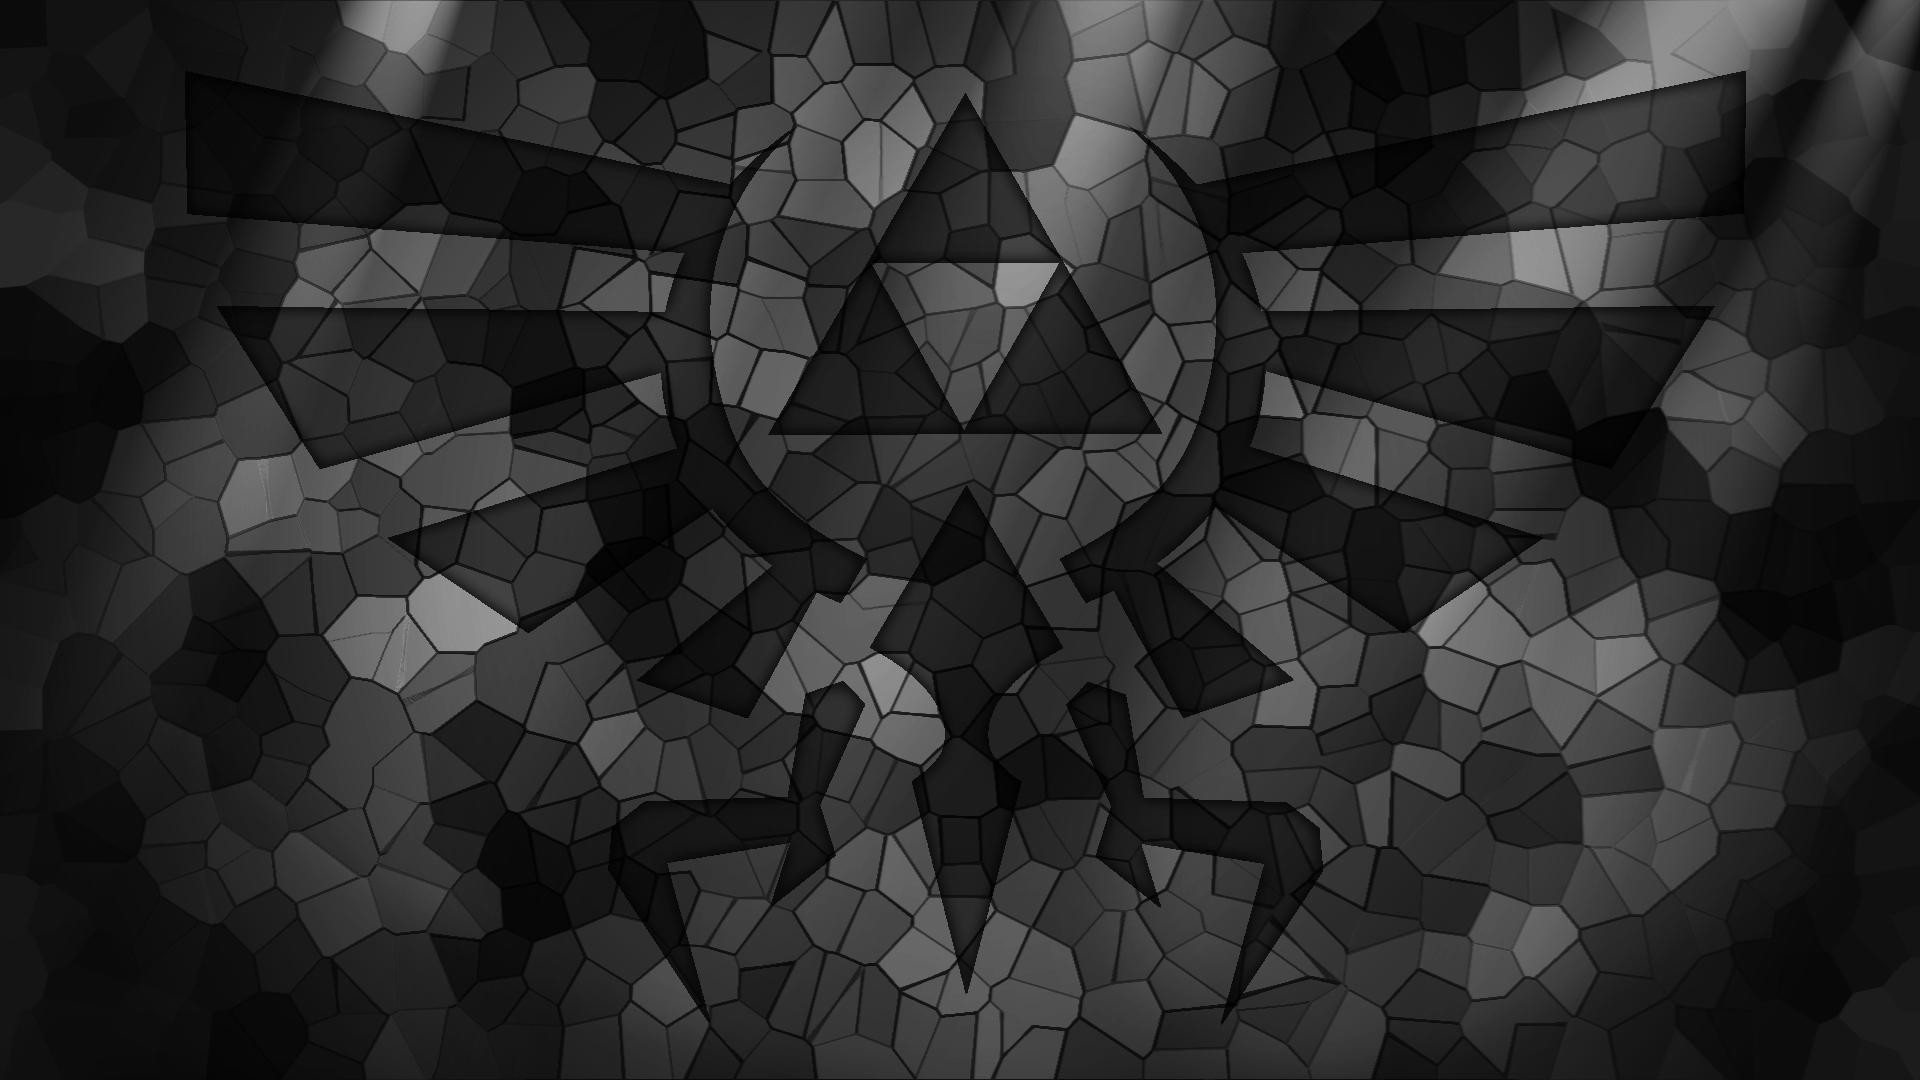 Triforce-Image